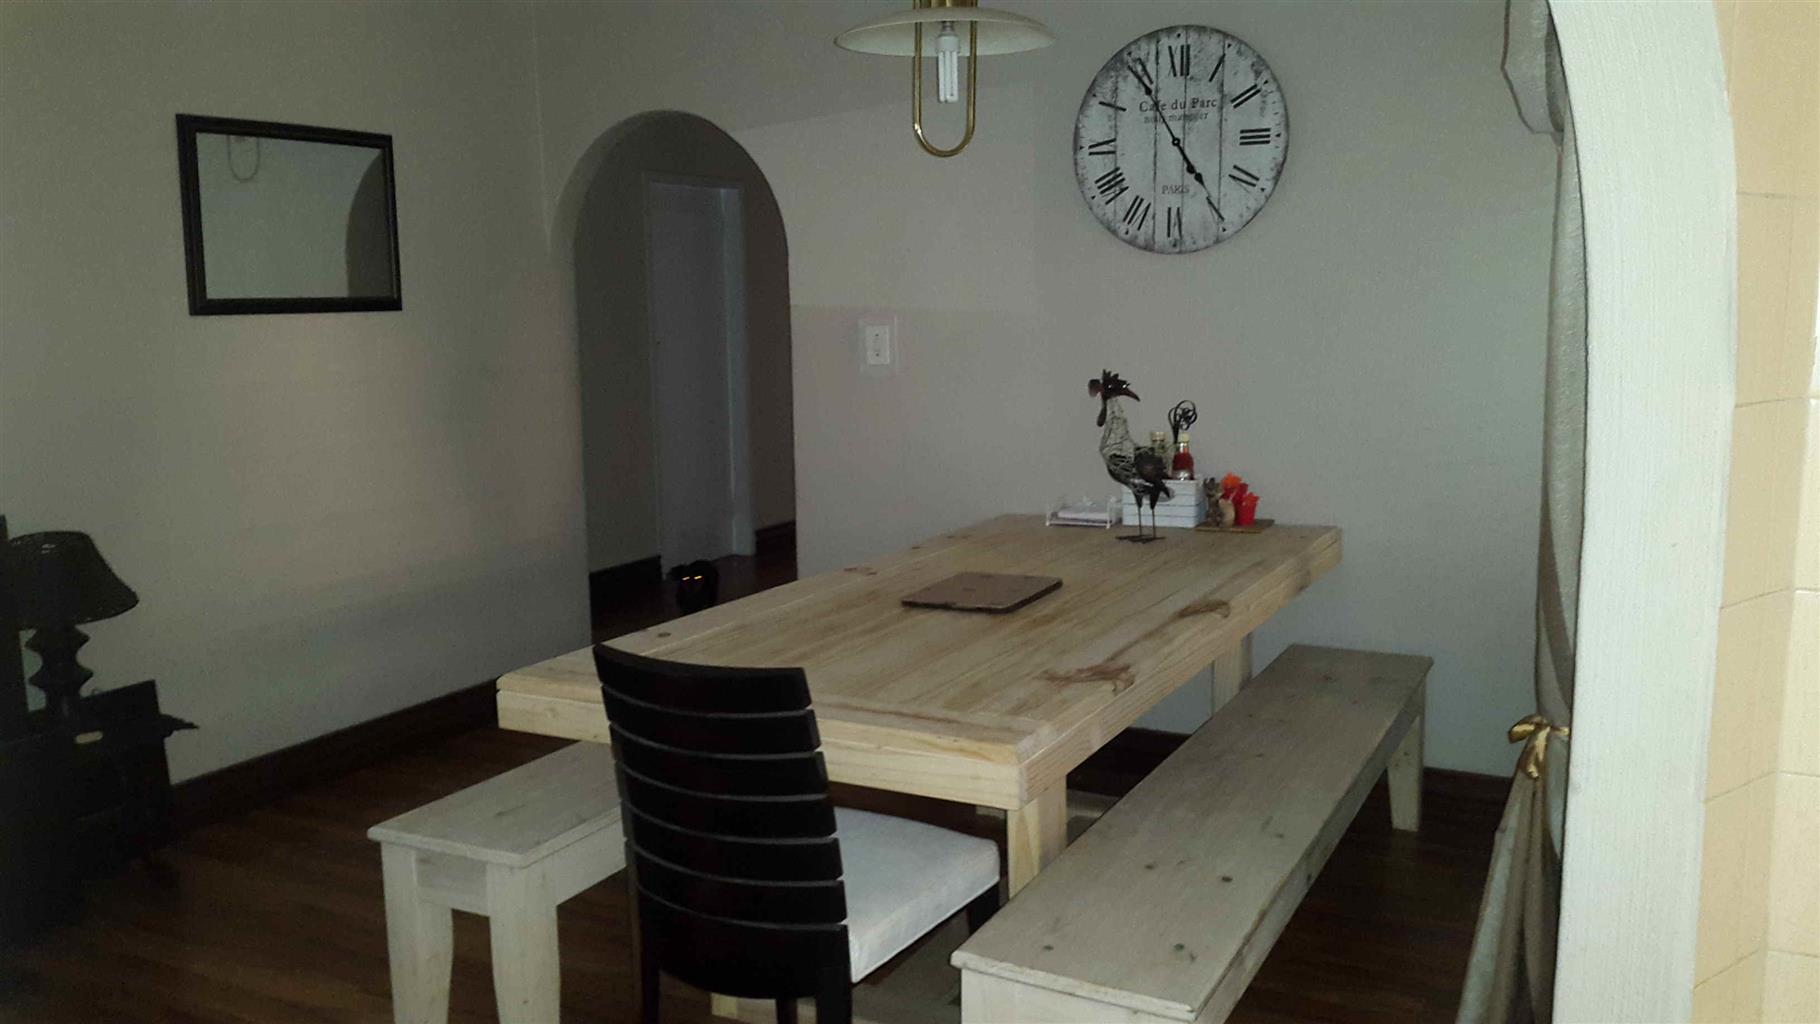 3 Bedroom House to rent Lyttelton